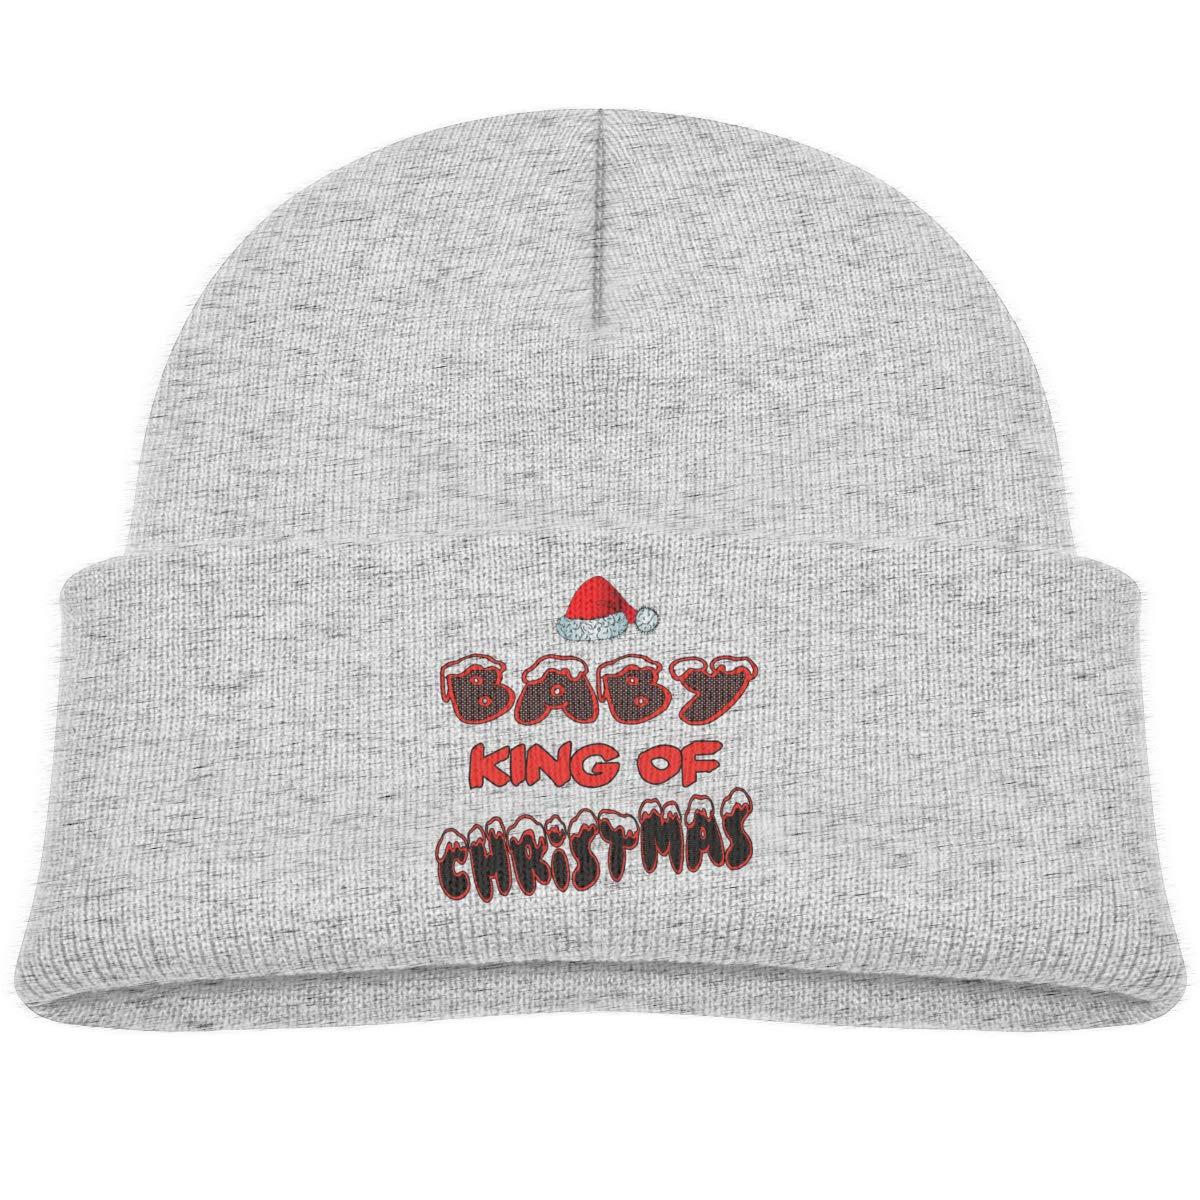 Baby King of Christmas Infant Skull Hats Baby Beanie Cap